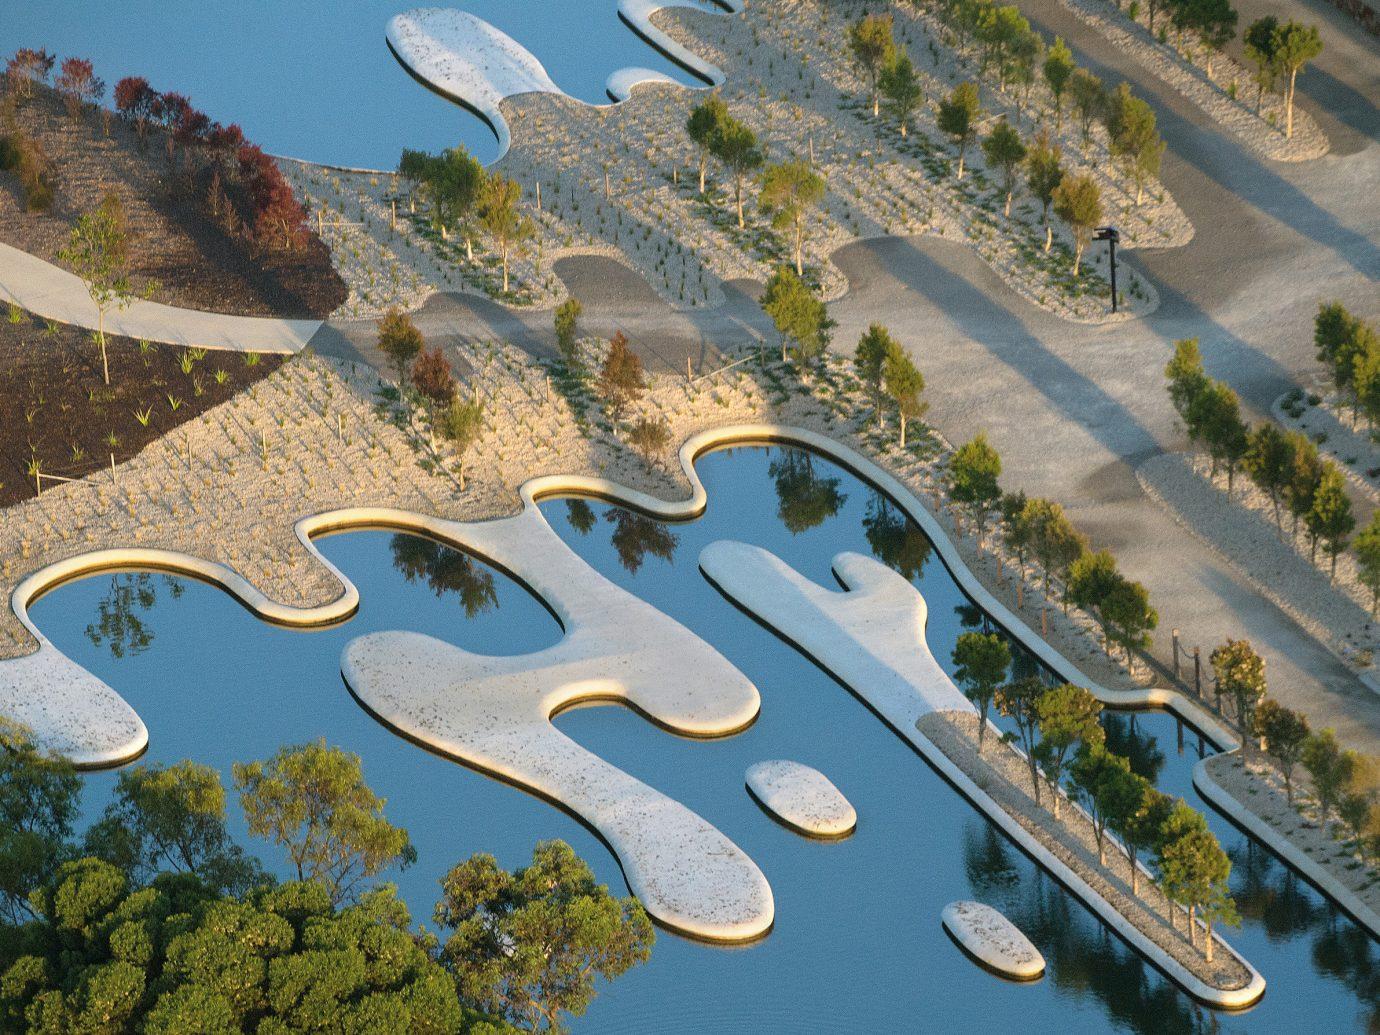 Offbeat aerial photography bird's eye view ecosystem residential area estate urban design screenshot